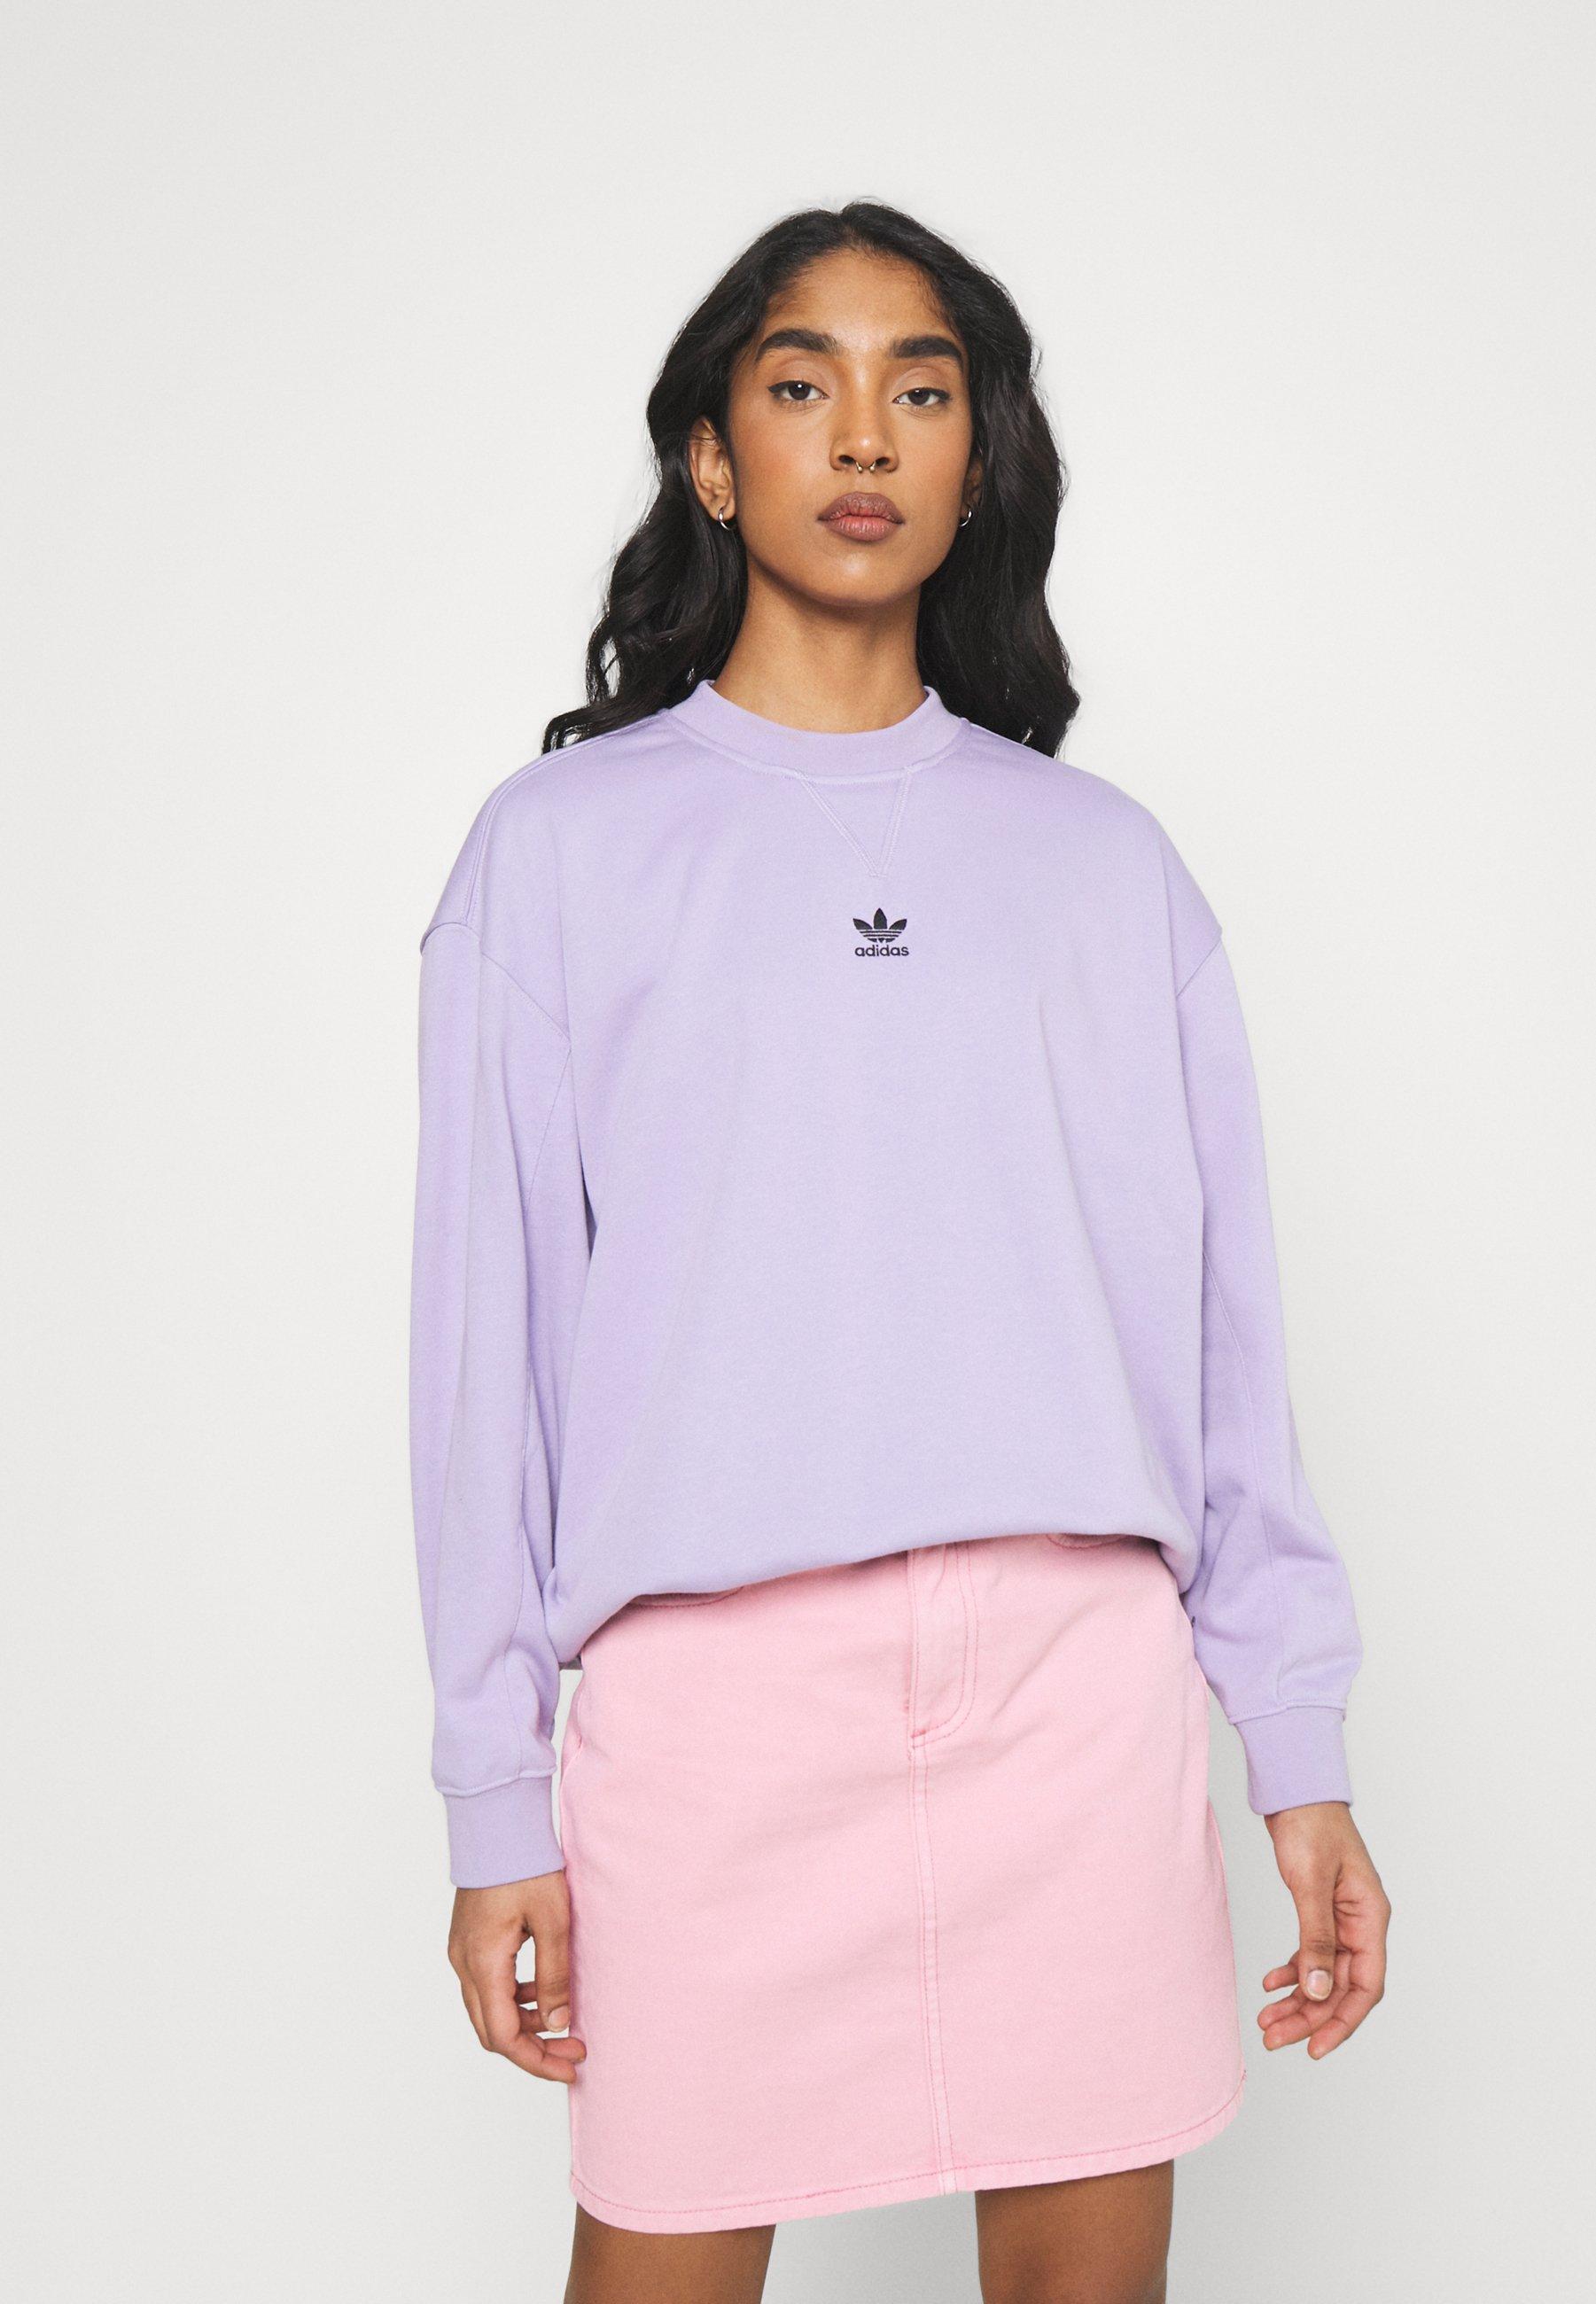 Women LOUNGEWEAR ADICOLOR ESSENTIALS SWEATSHIRT - Sweatshirt